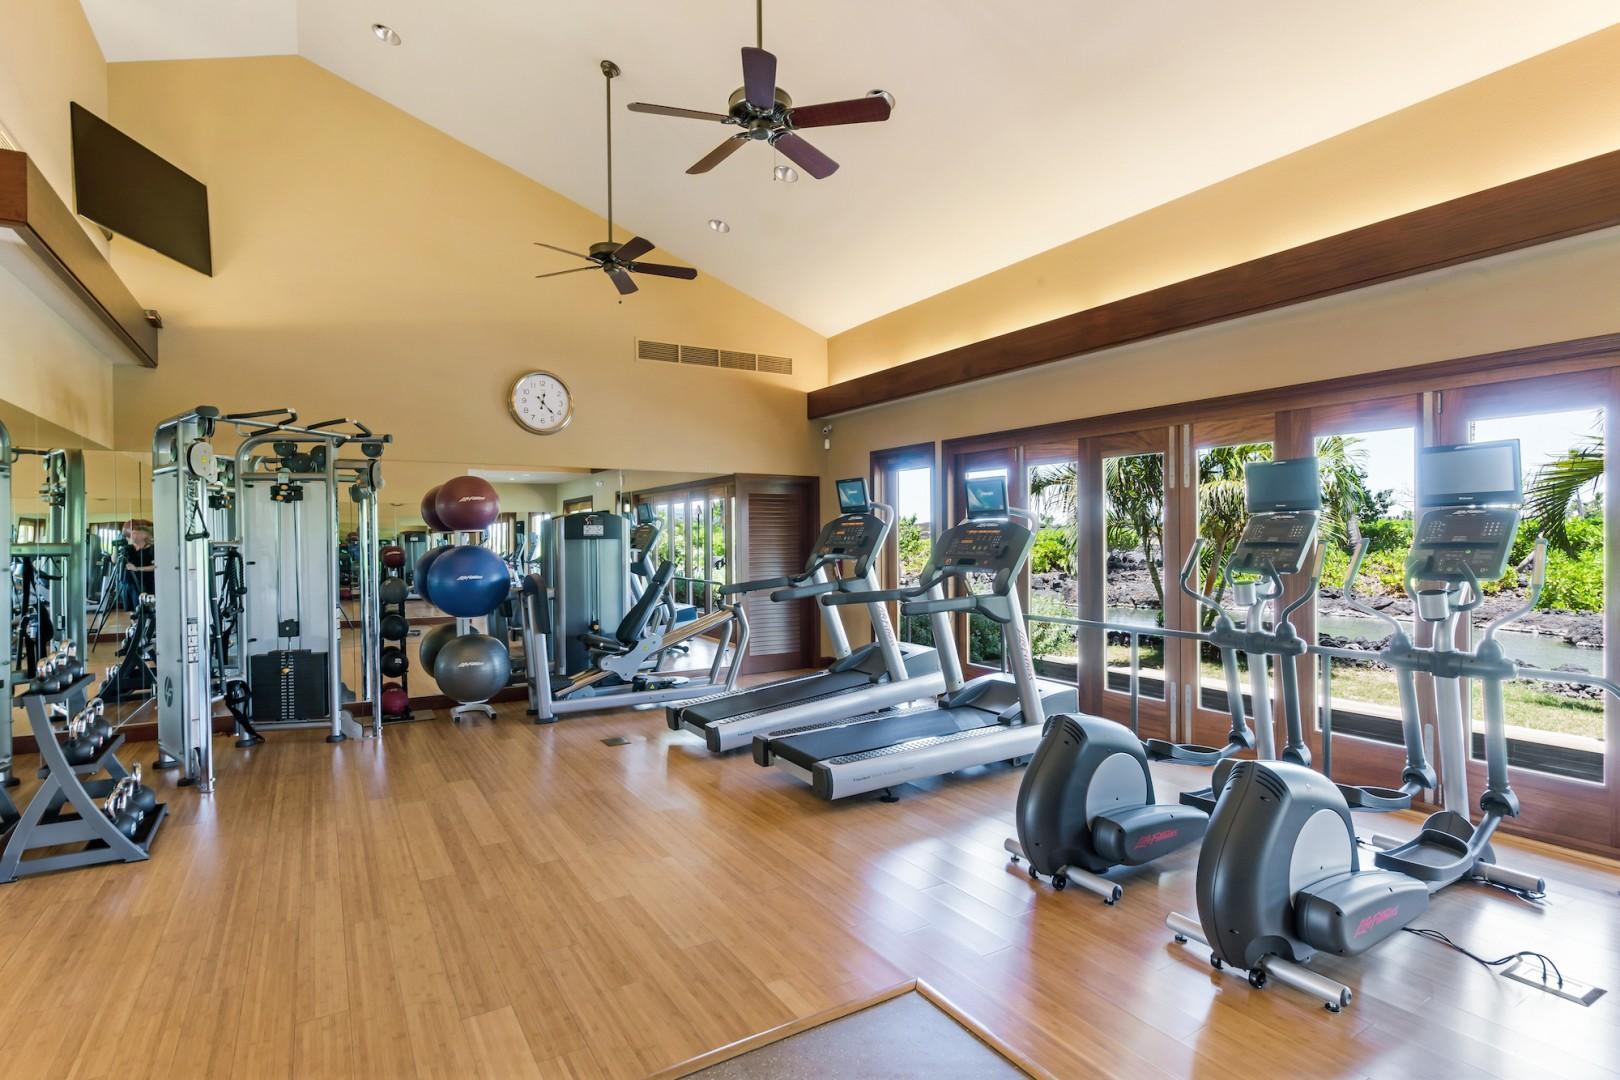 Fitness Enthusiasts Will Love the Hana Pono Park Fitness Center!